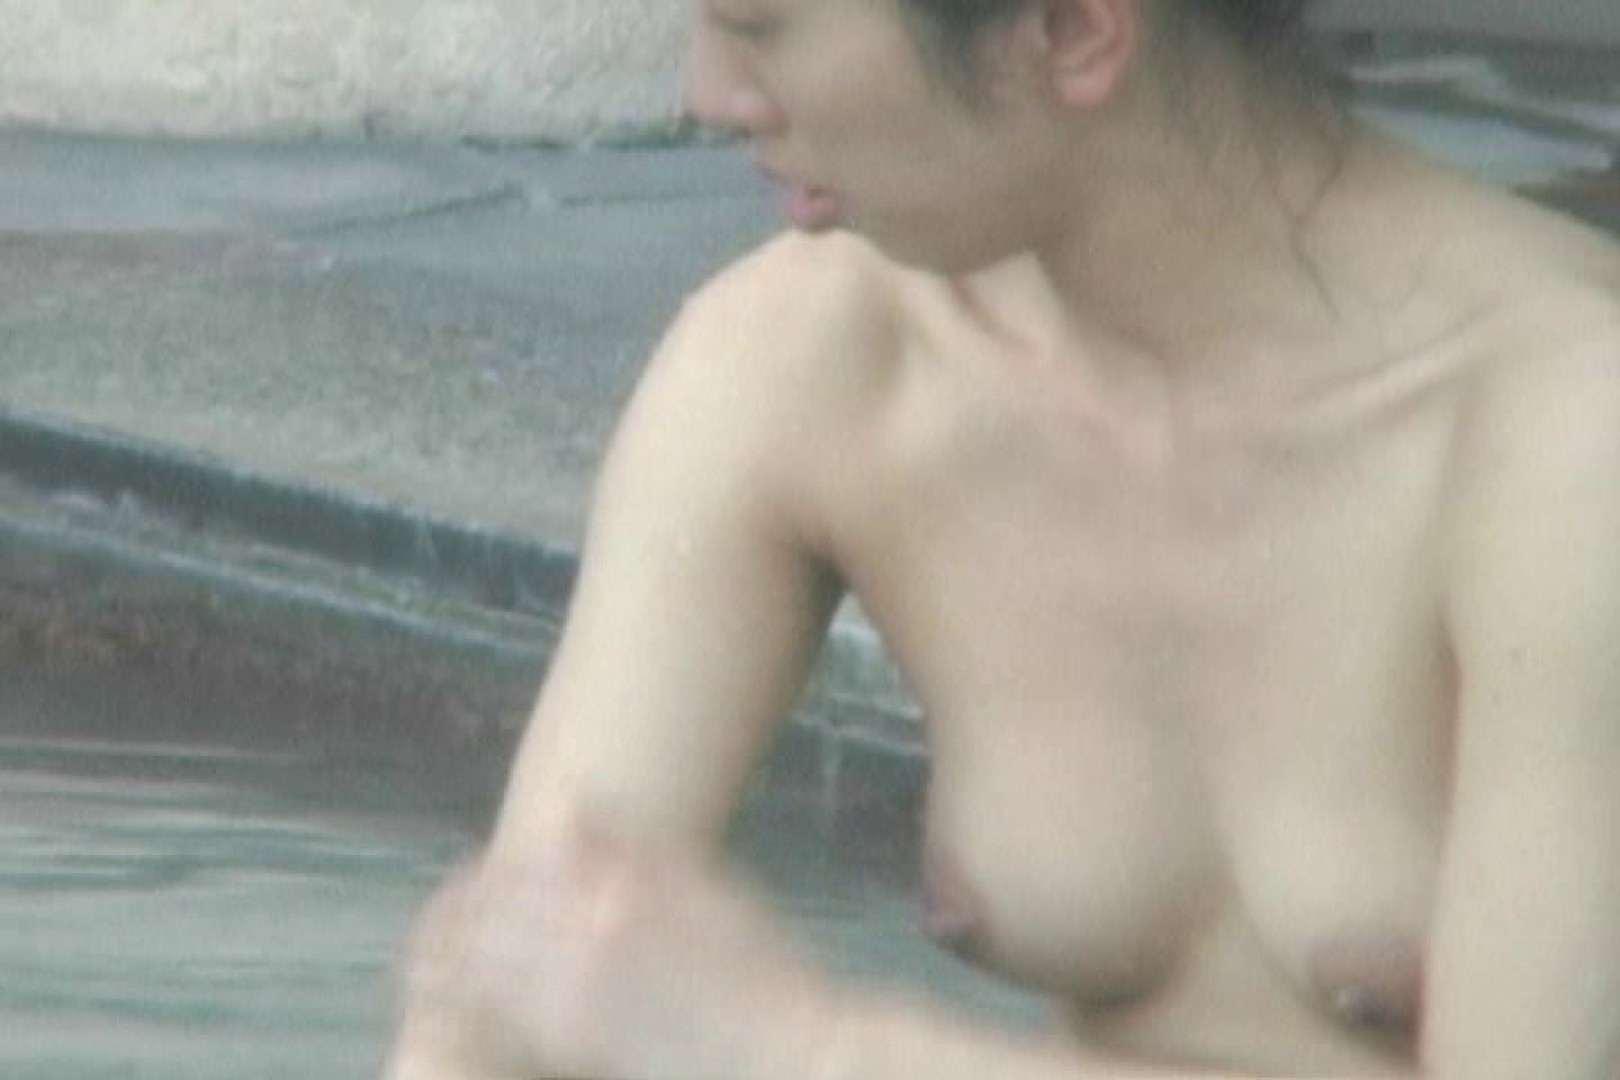 Aquaな露天風呂Vol.588 いやらしいOL 盗撮画像 41連発 27